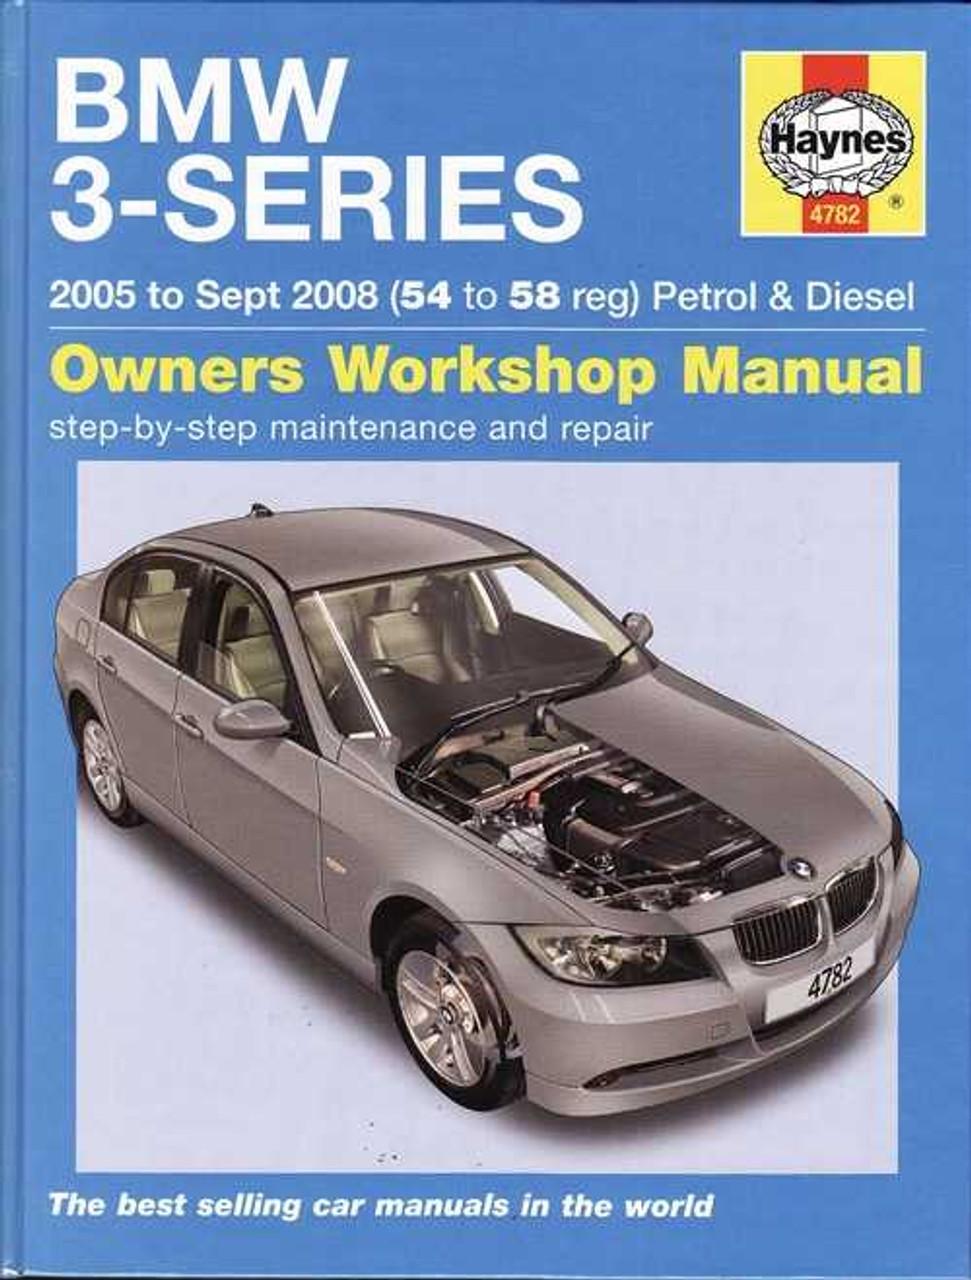 bmw 3 series e90 e91 petrol and diesel 2005 2008 workshop manual rh automotobookshop com au 2005 bmw 325xi owners manual 2005 bmw 325i user manual